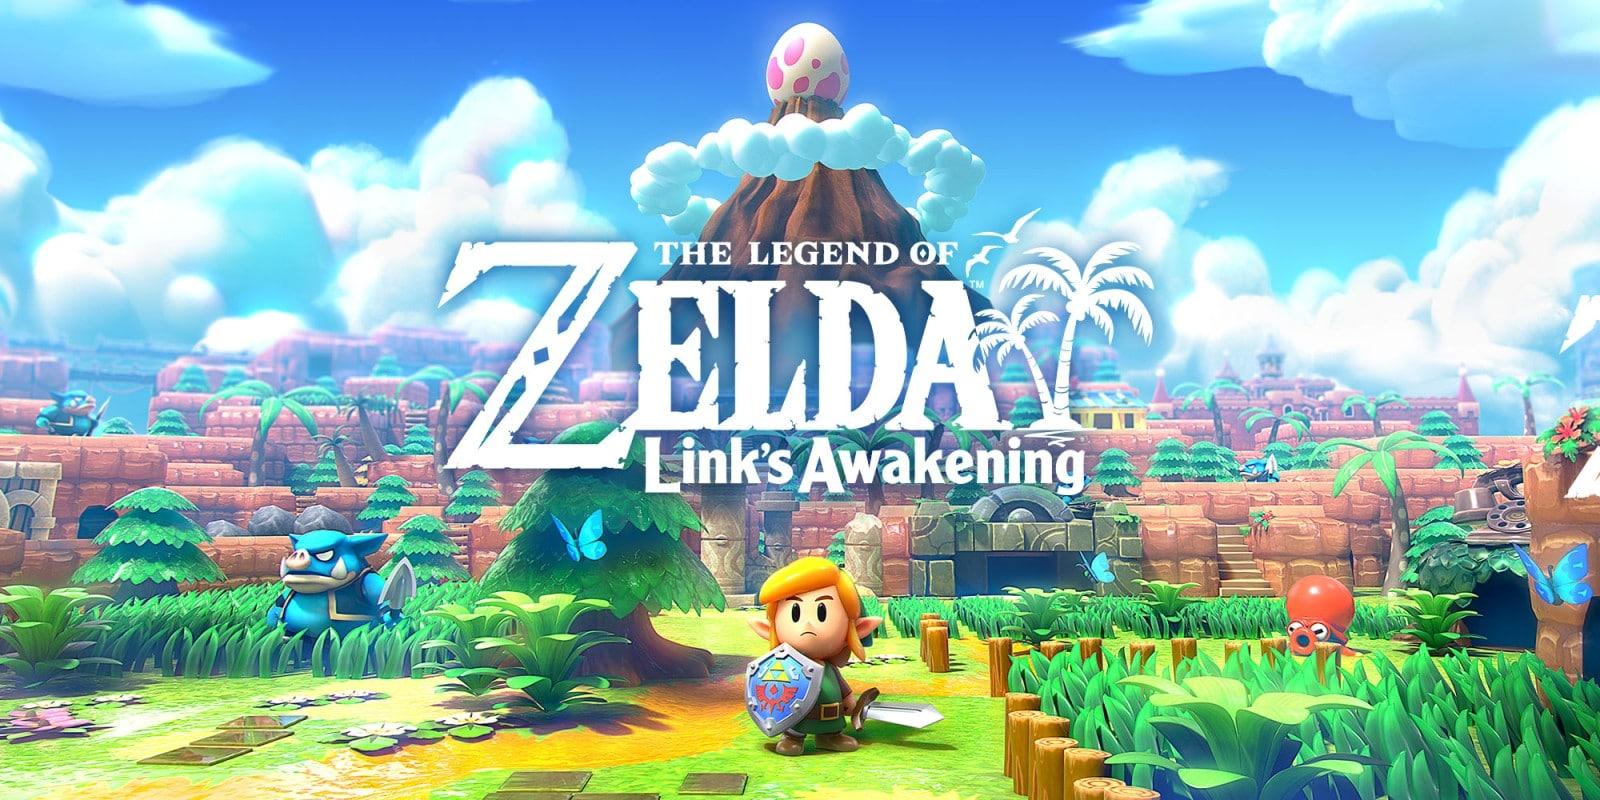 link's awakening jeu video y'a quoi qui sort